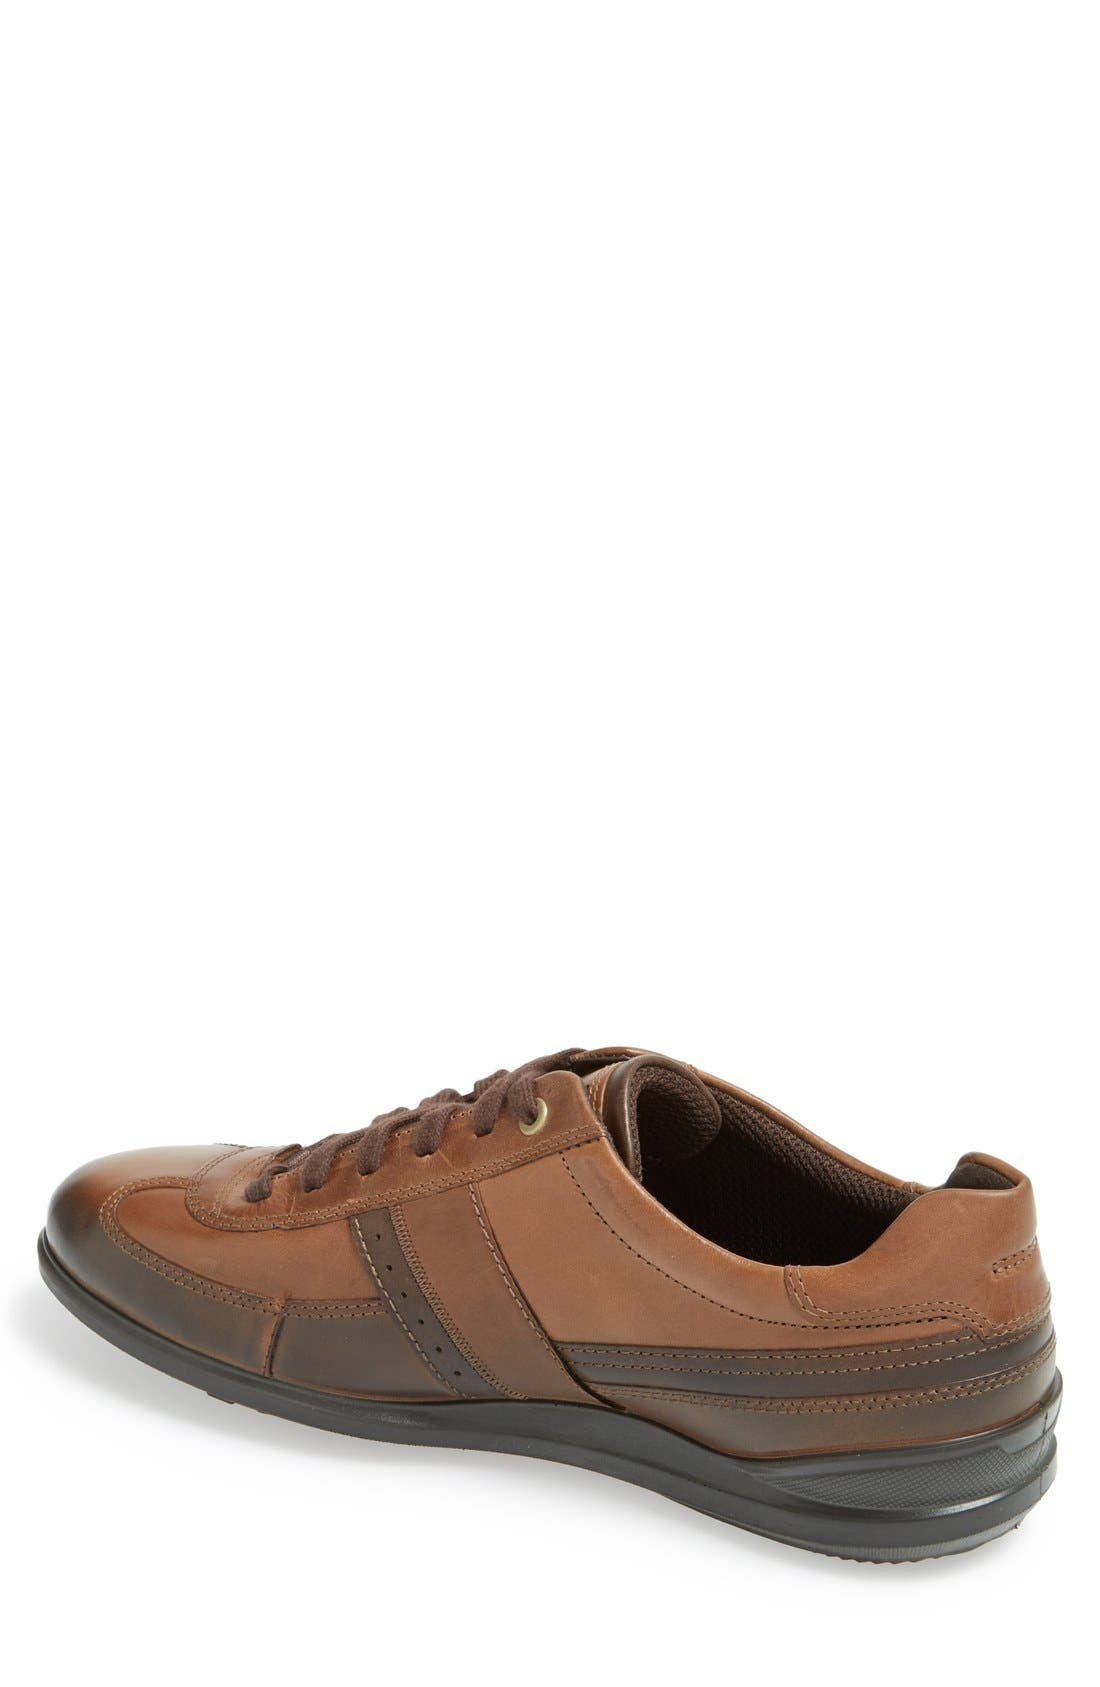 Alternate Image 2  - ECCO 'Chander' Sneaker (Men)